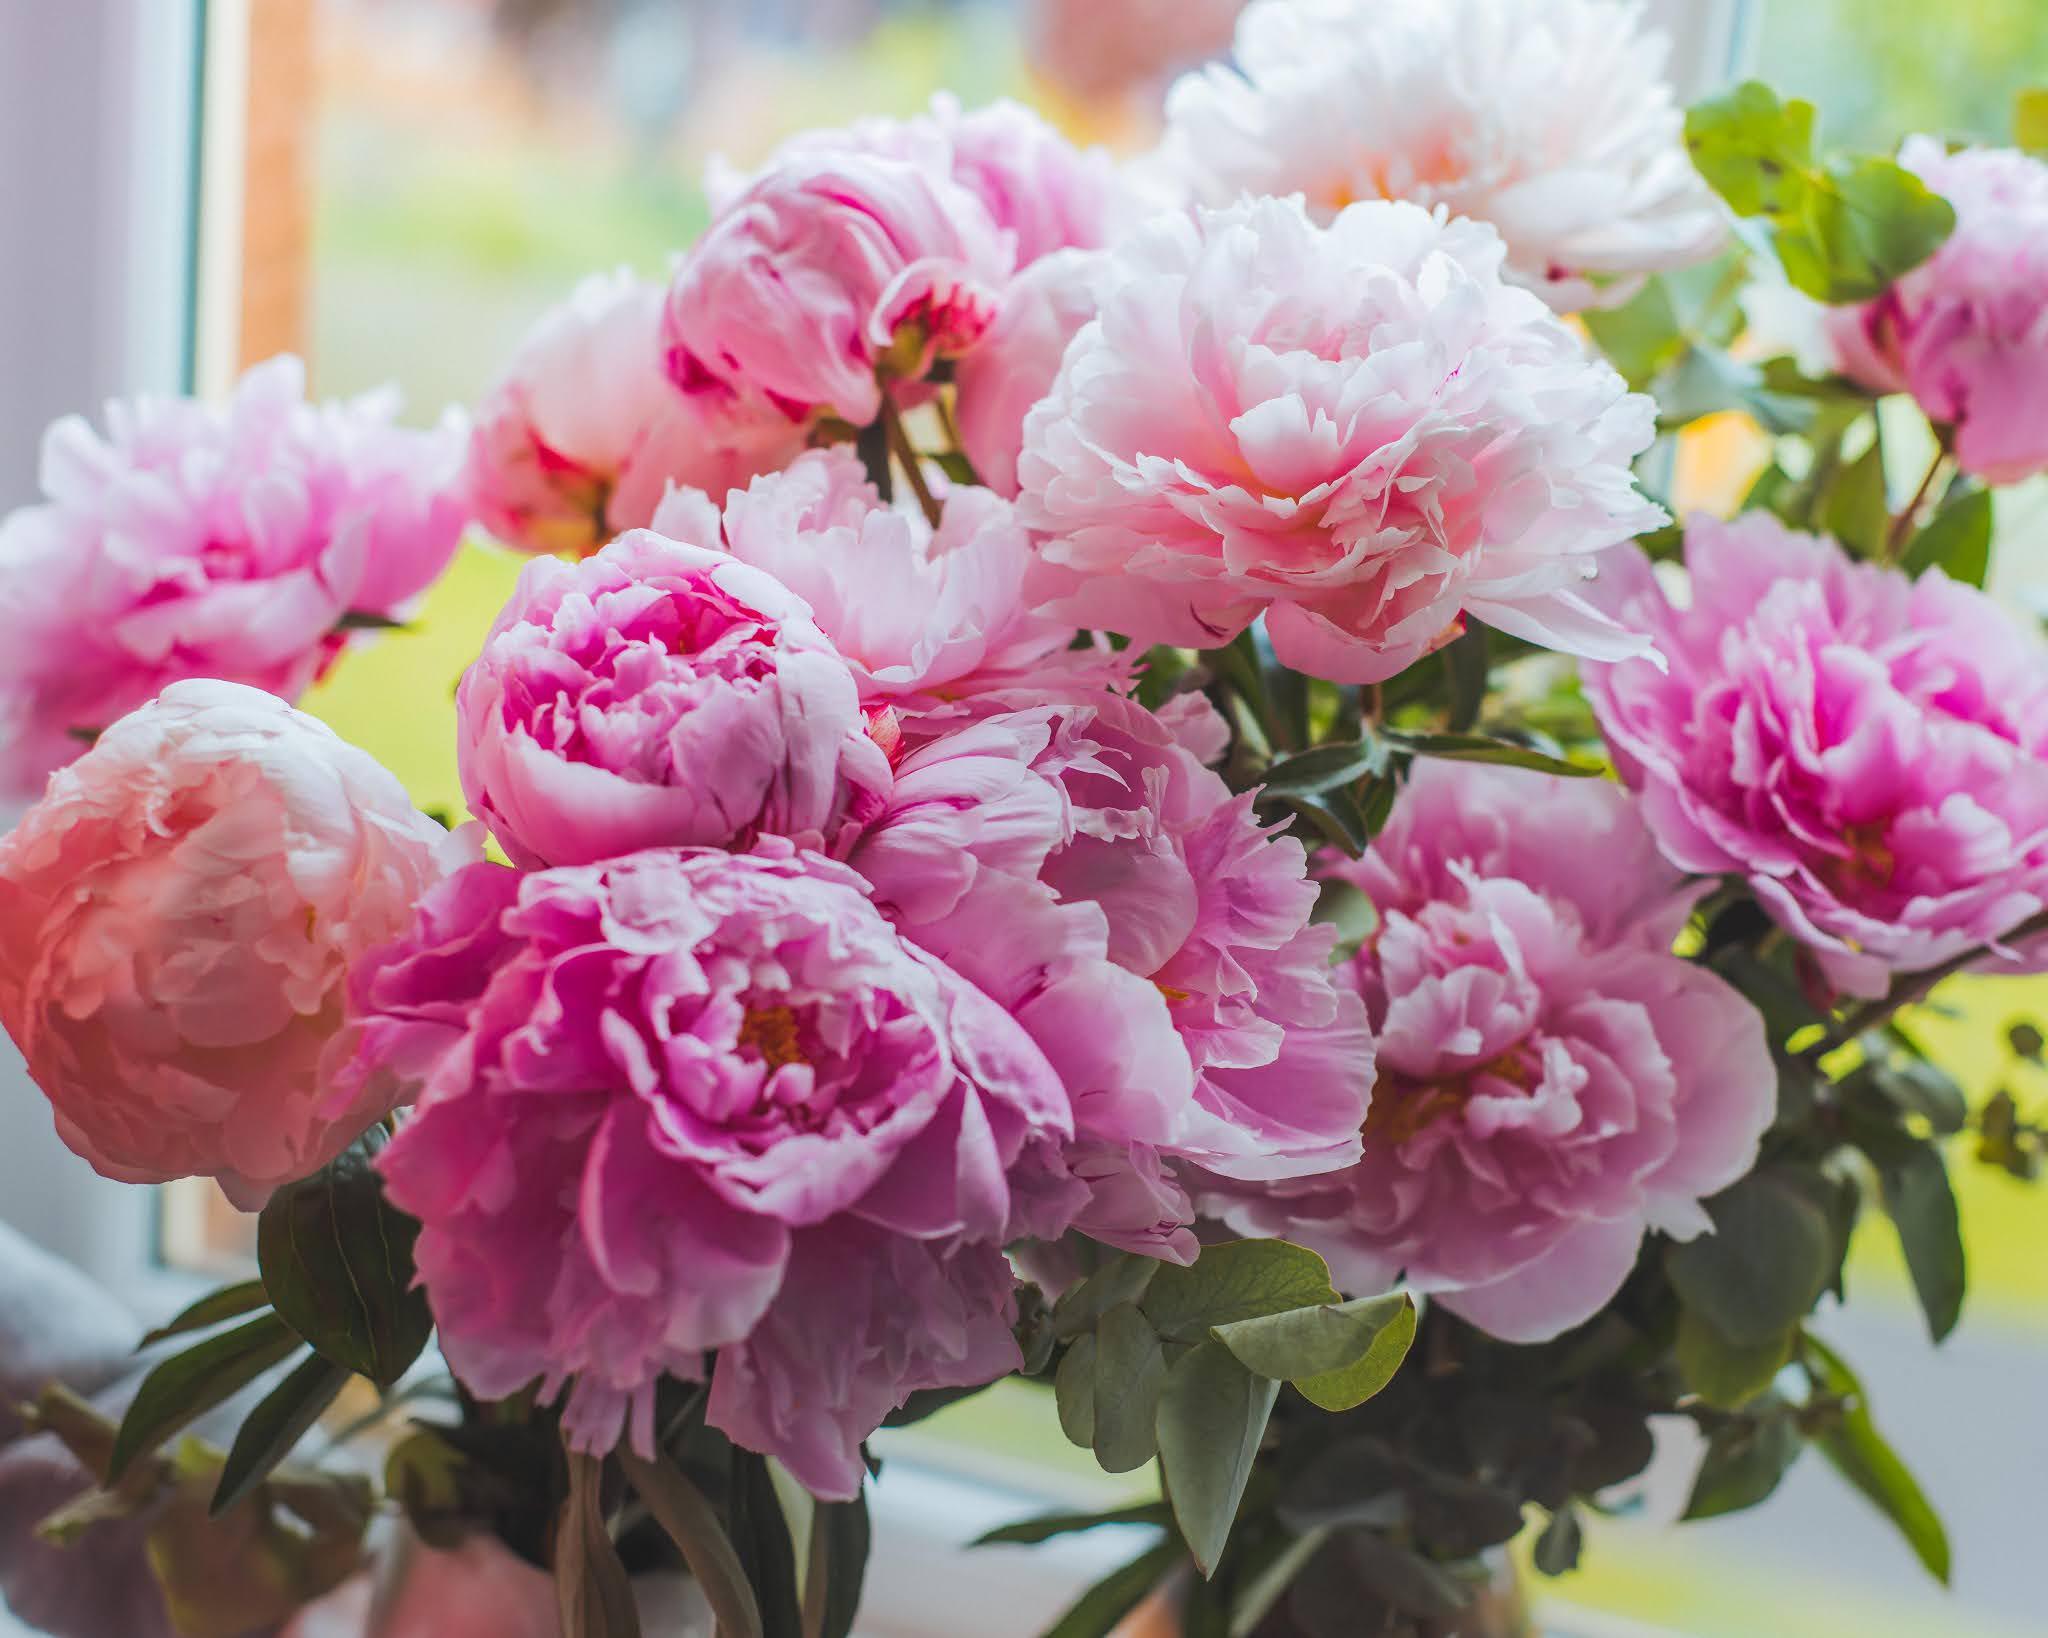 arena flowers peonies roses liquidgrain liquid grain discount code